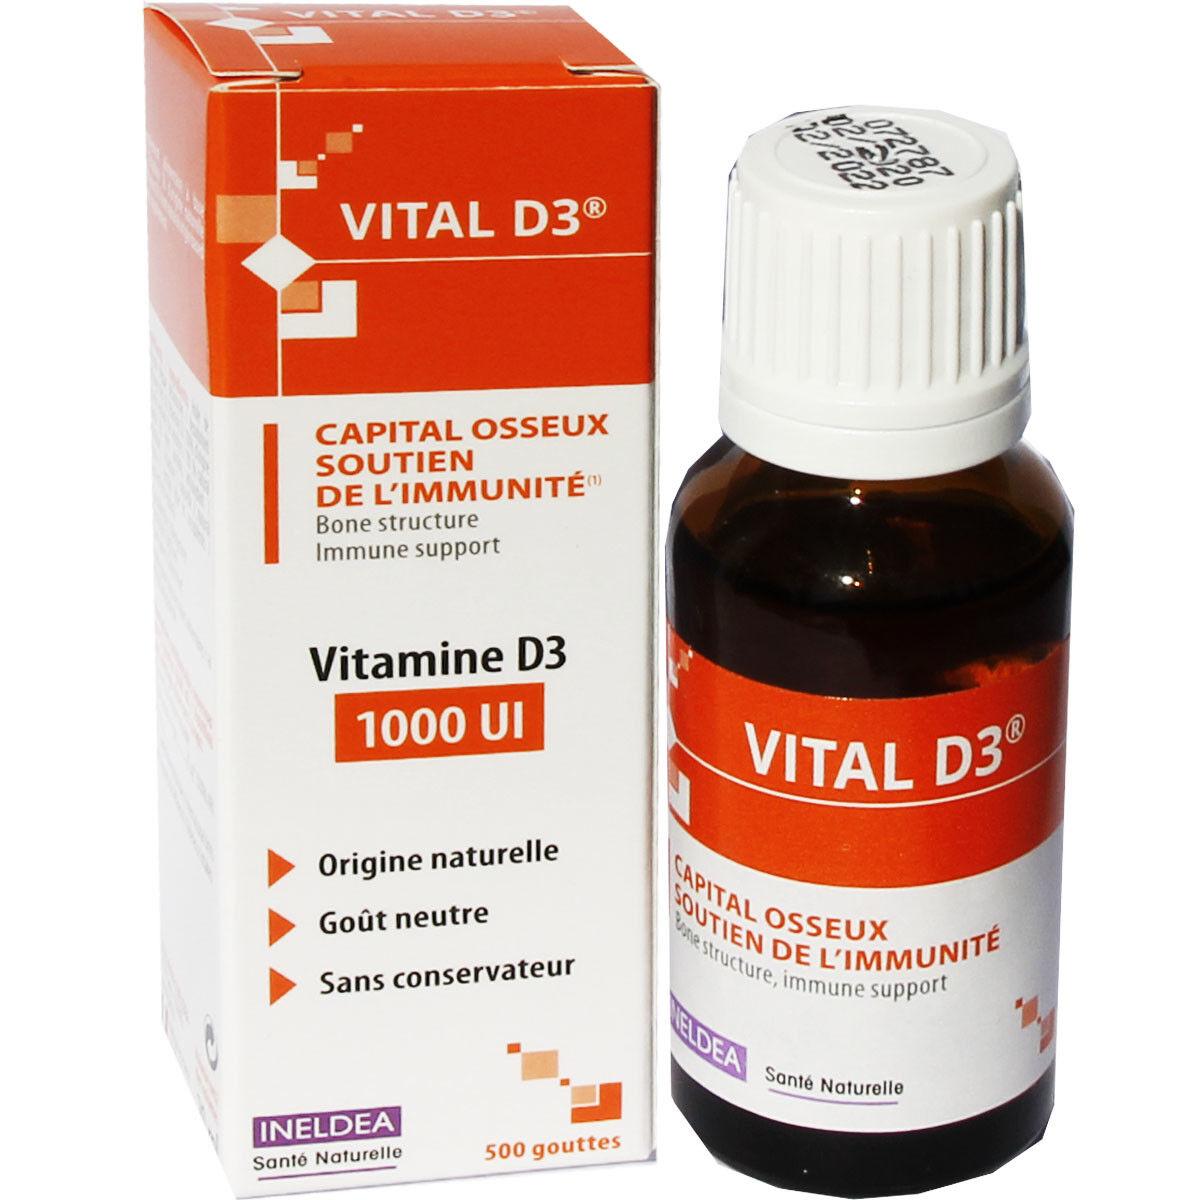 Ineldea vital d3 vitamine d3 1000ui 500 gouttes